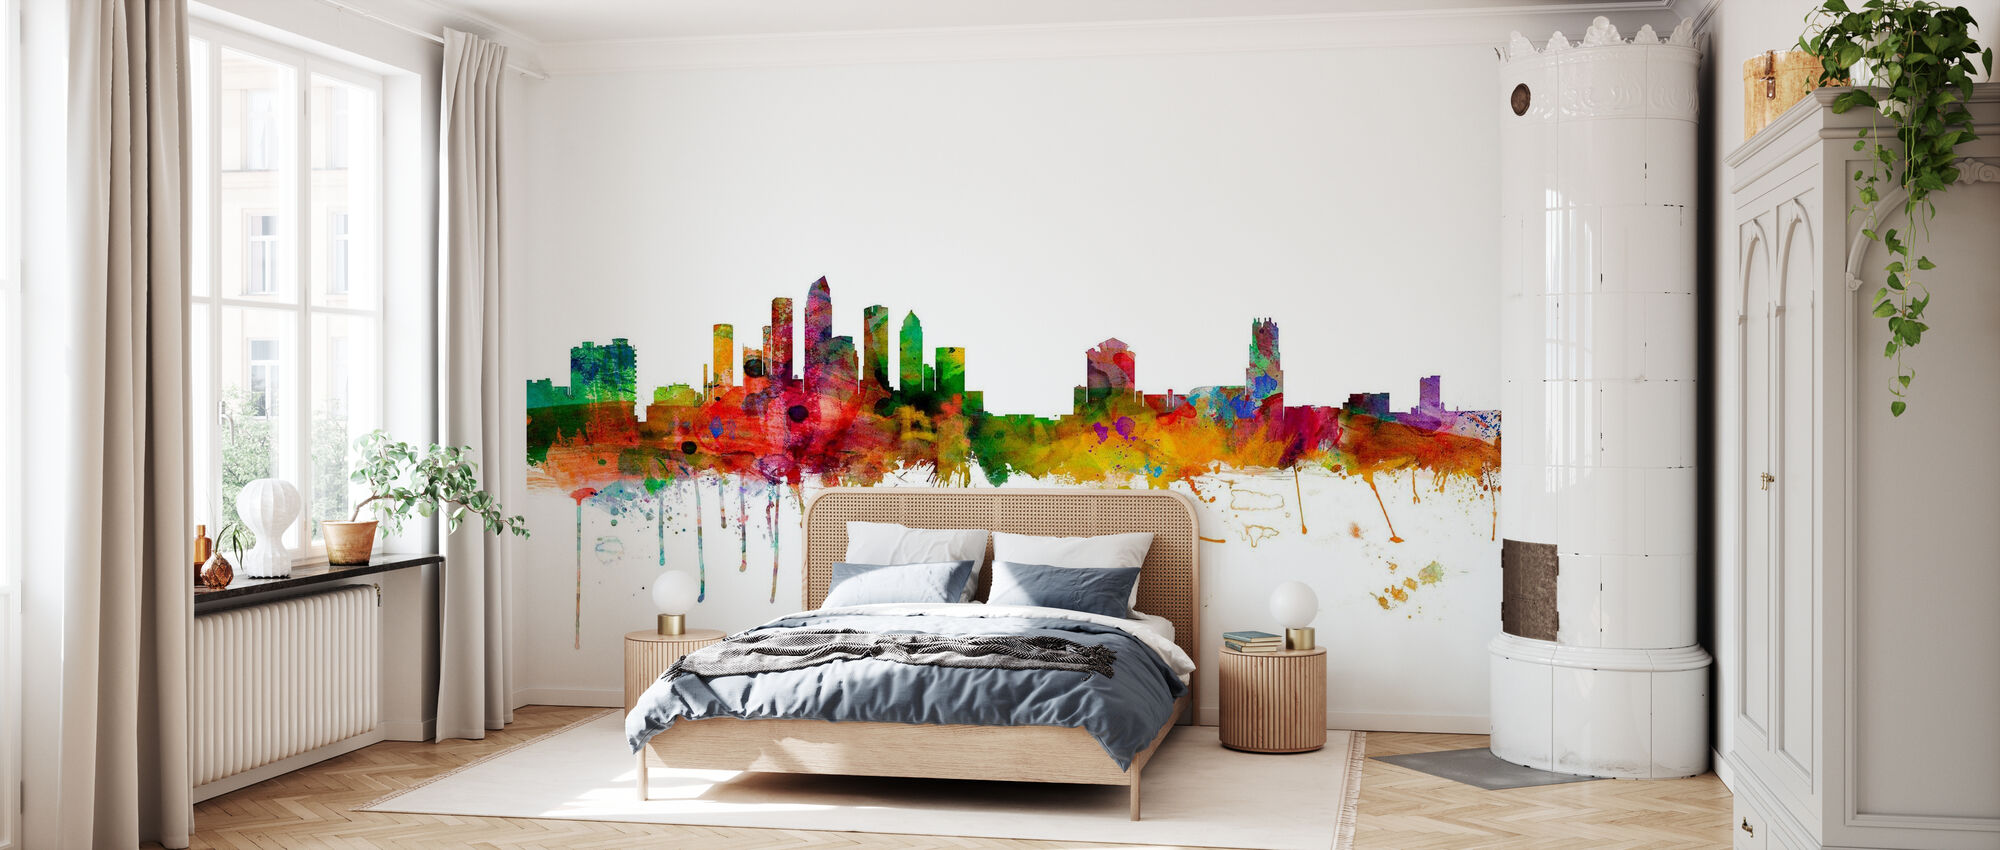 Tampa Florida Skyline - Wallpaper - Bedroom